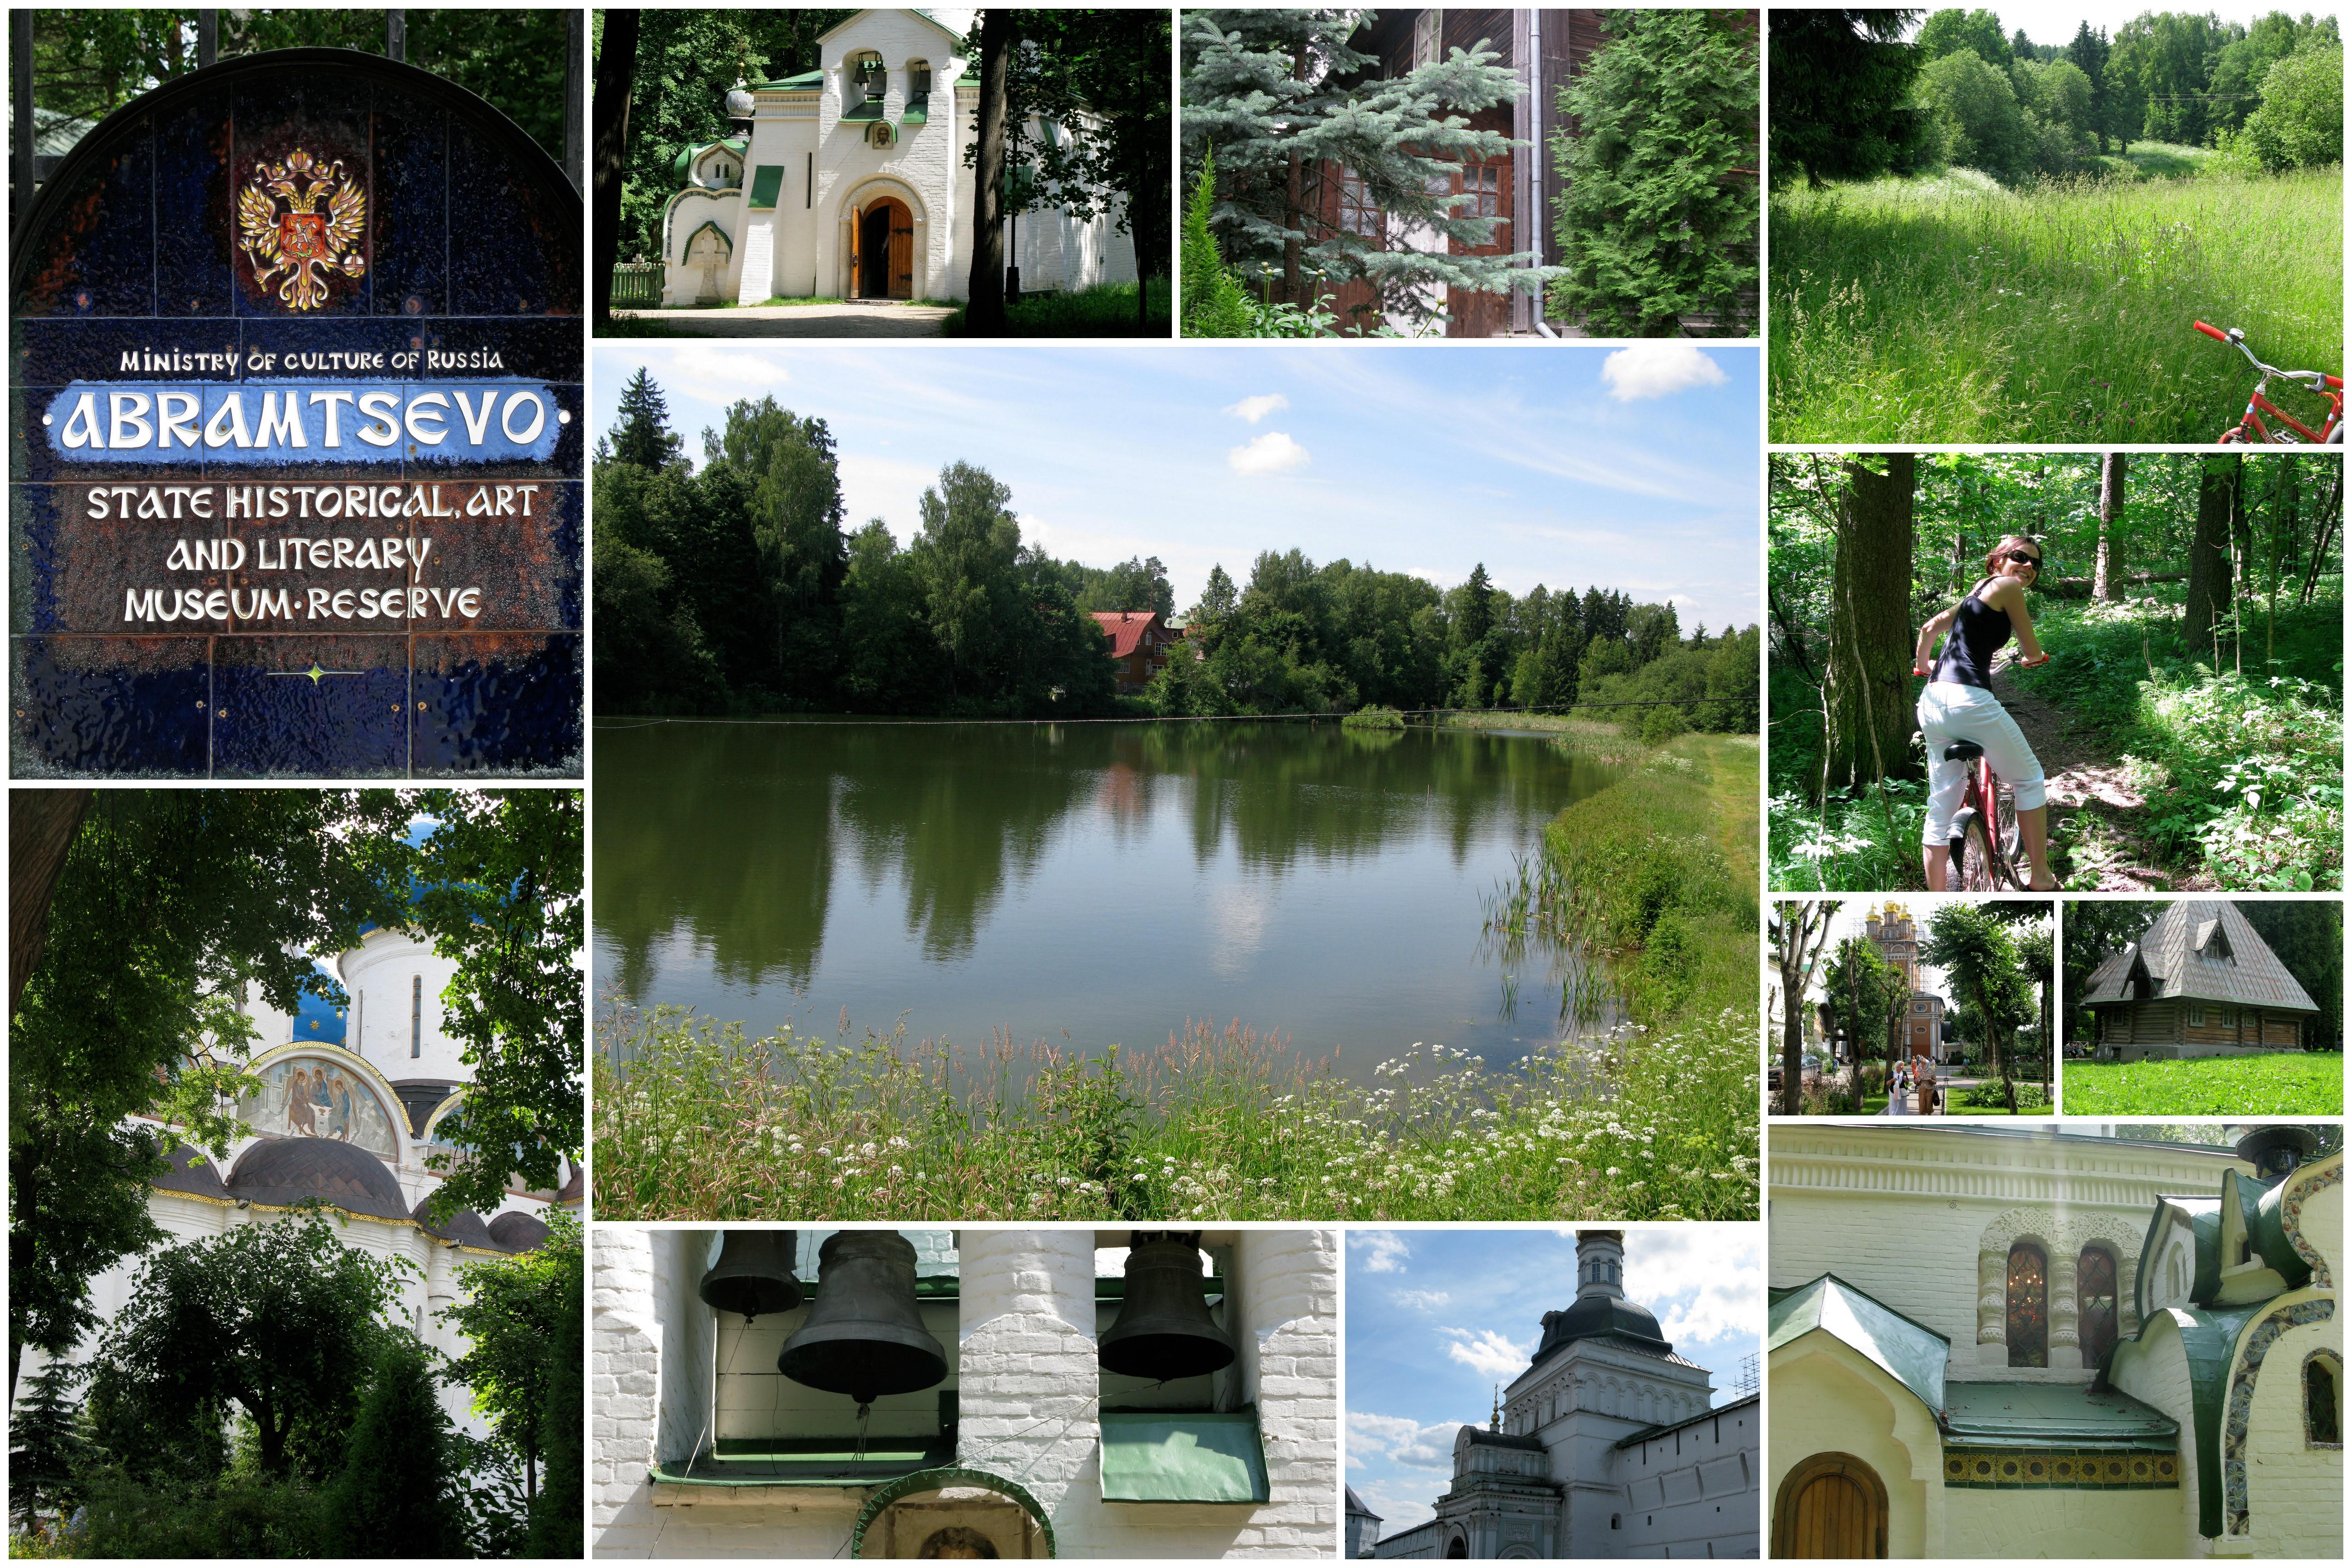 On the way to the Abramtsevo estate 4